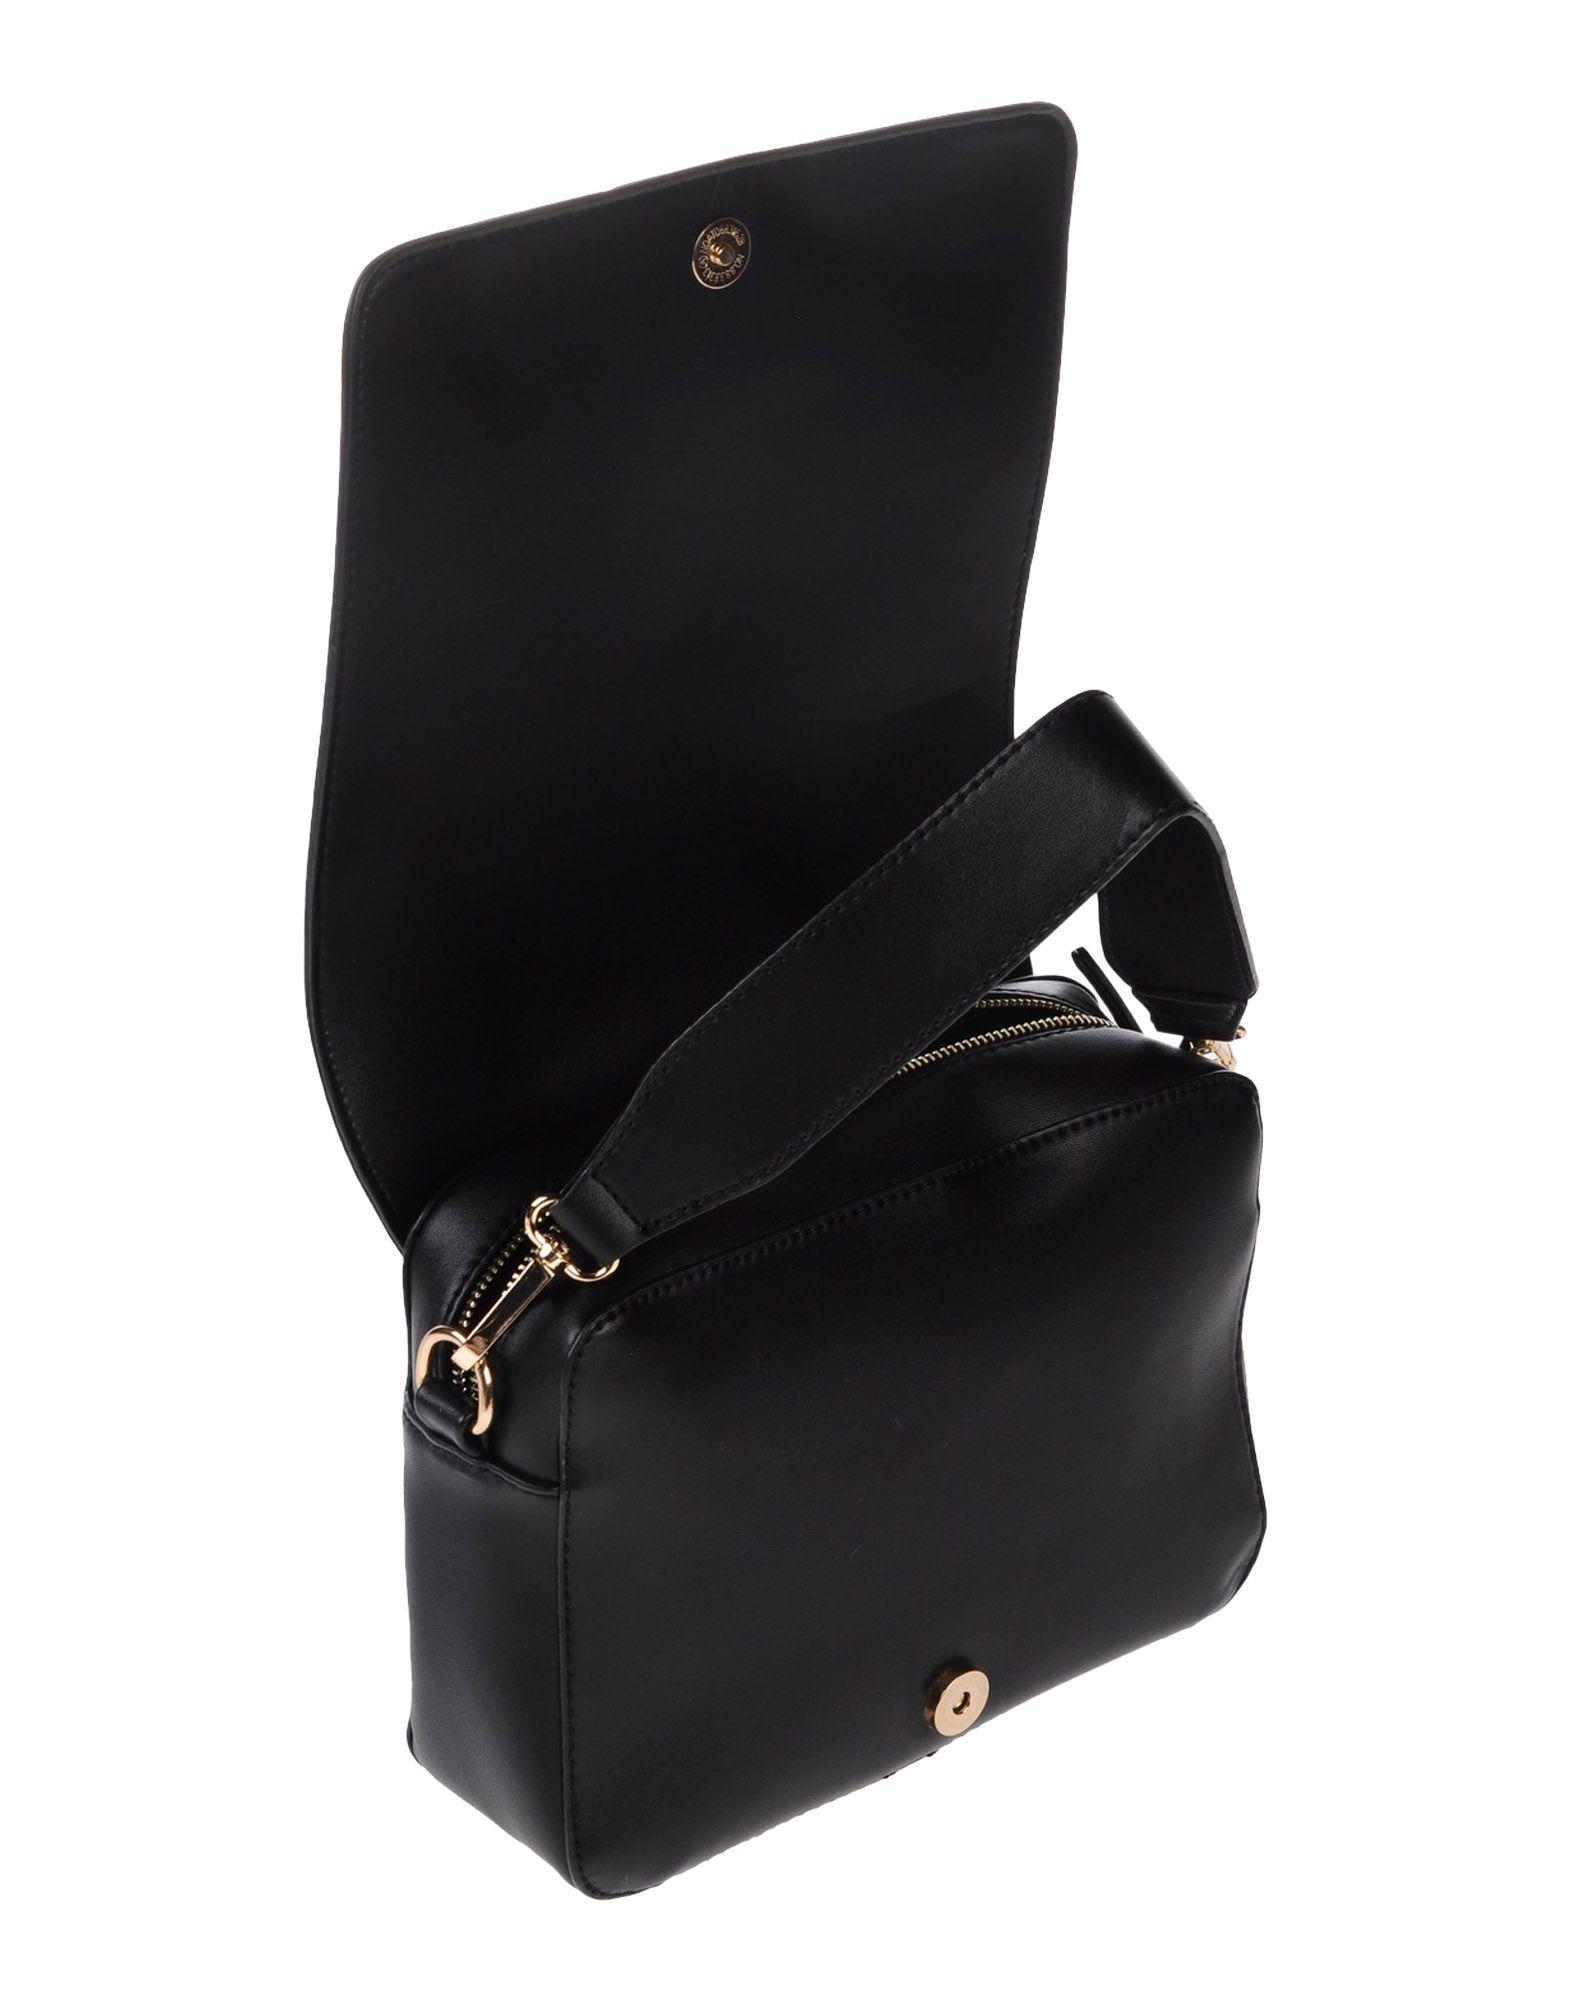 Pepe Jeans Cross-body Bag in Black